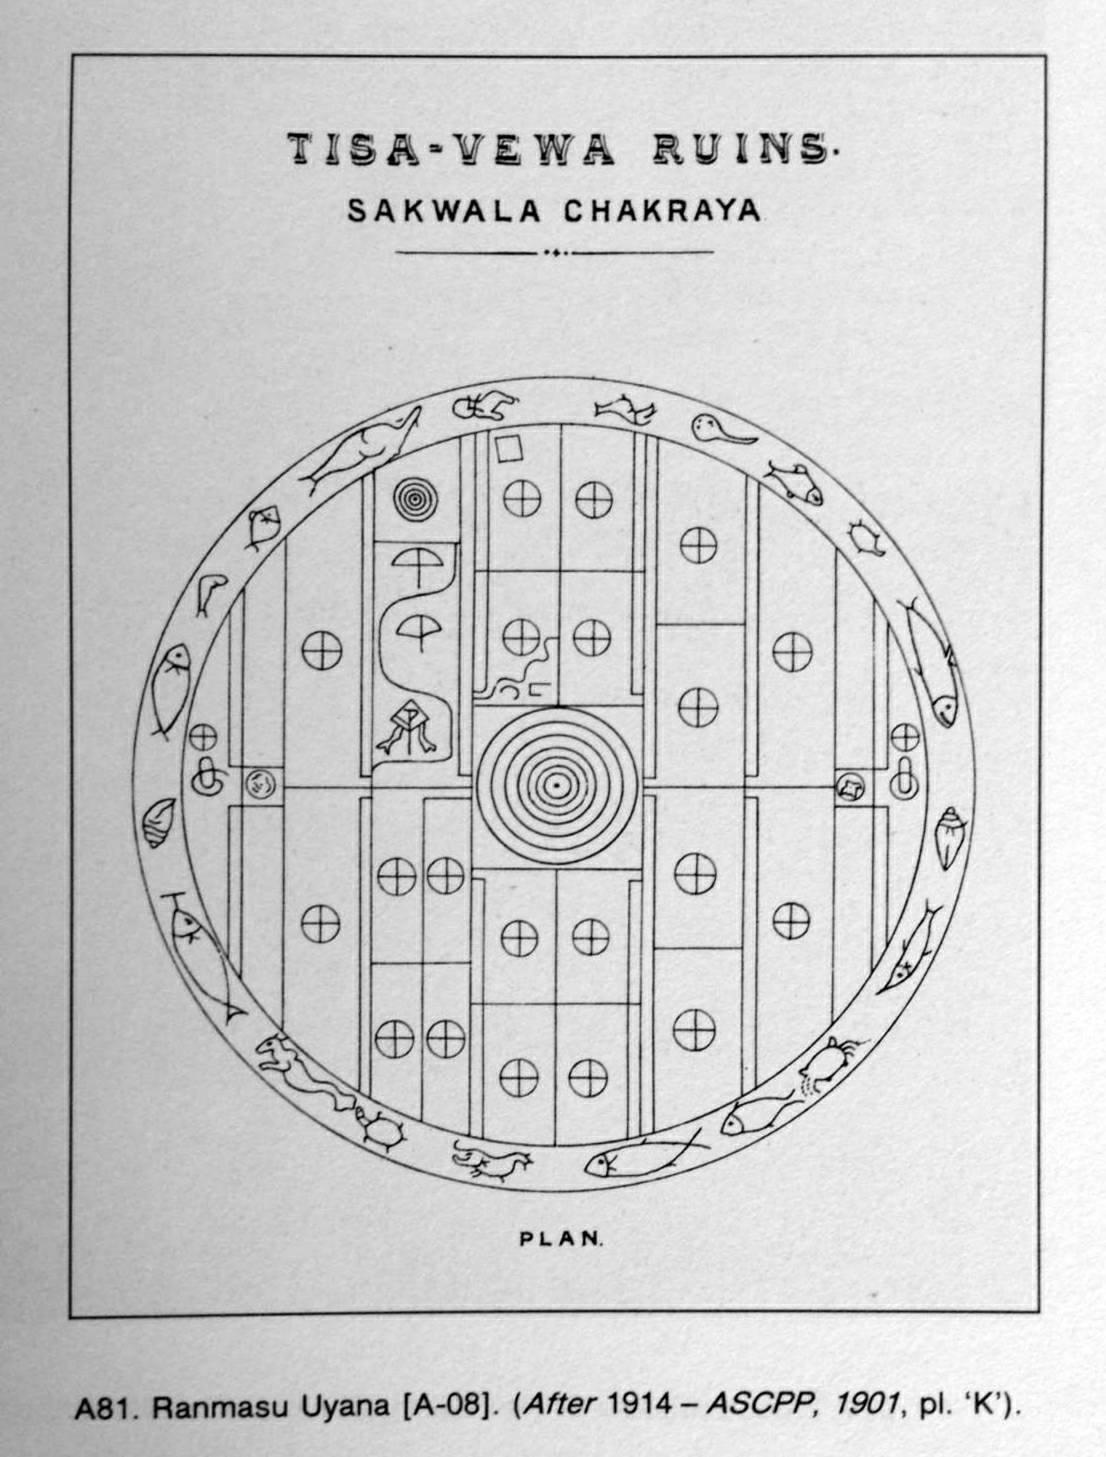 Sakwala Chakraya